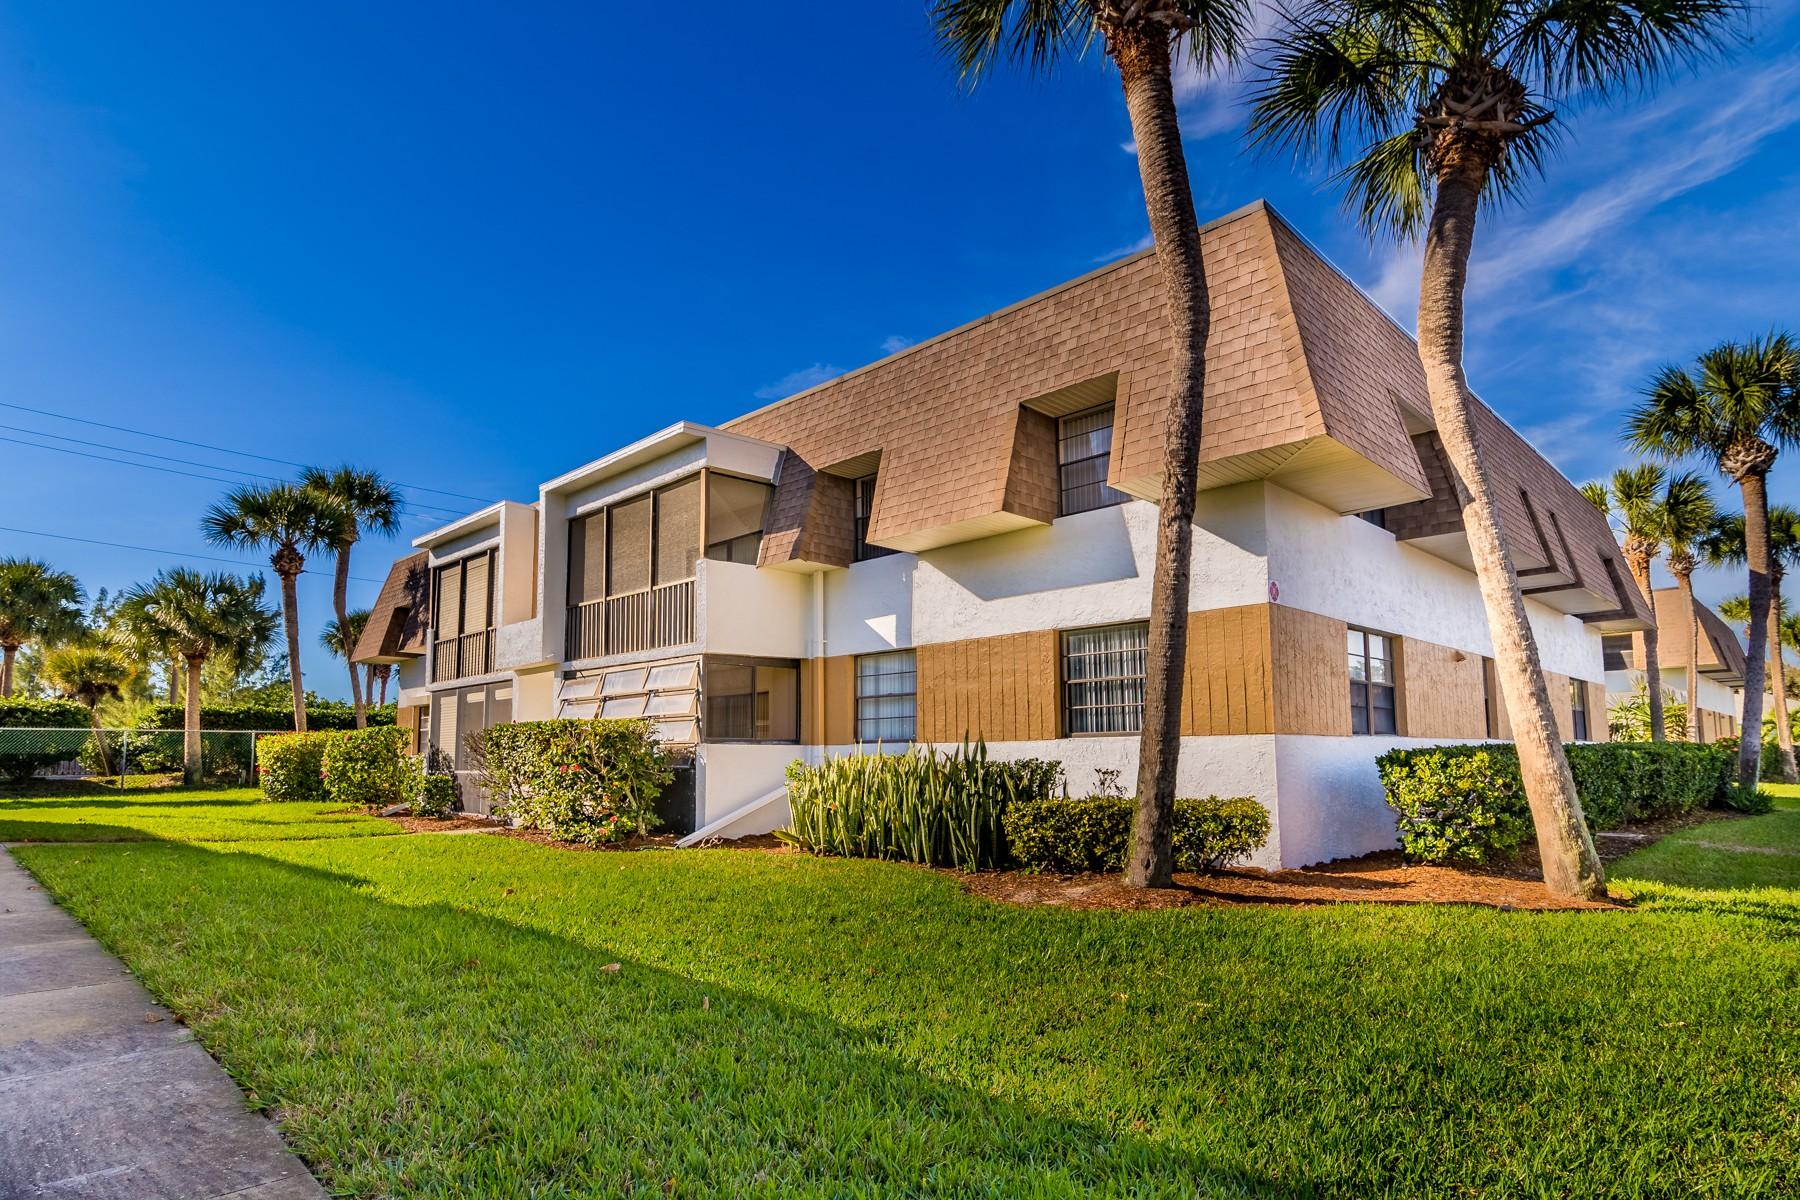 Palm Colony 2700 N Highway A1A #7-202 Indialantic, Florida 32903 Stati Uniti